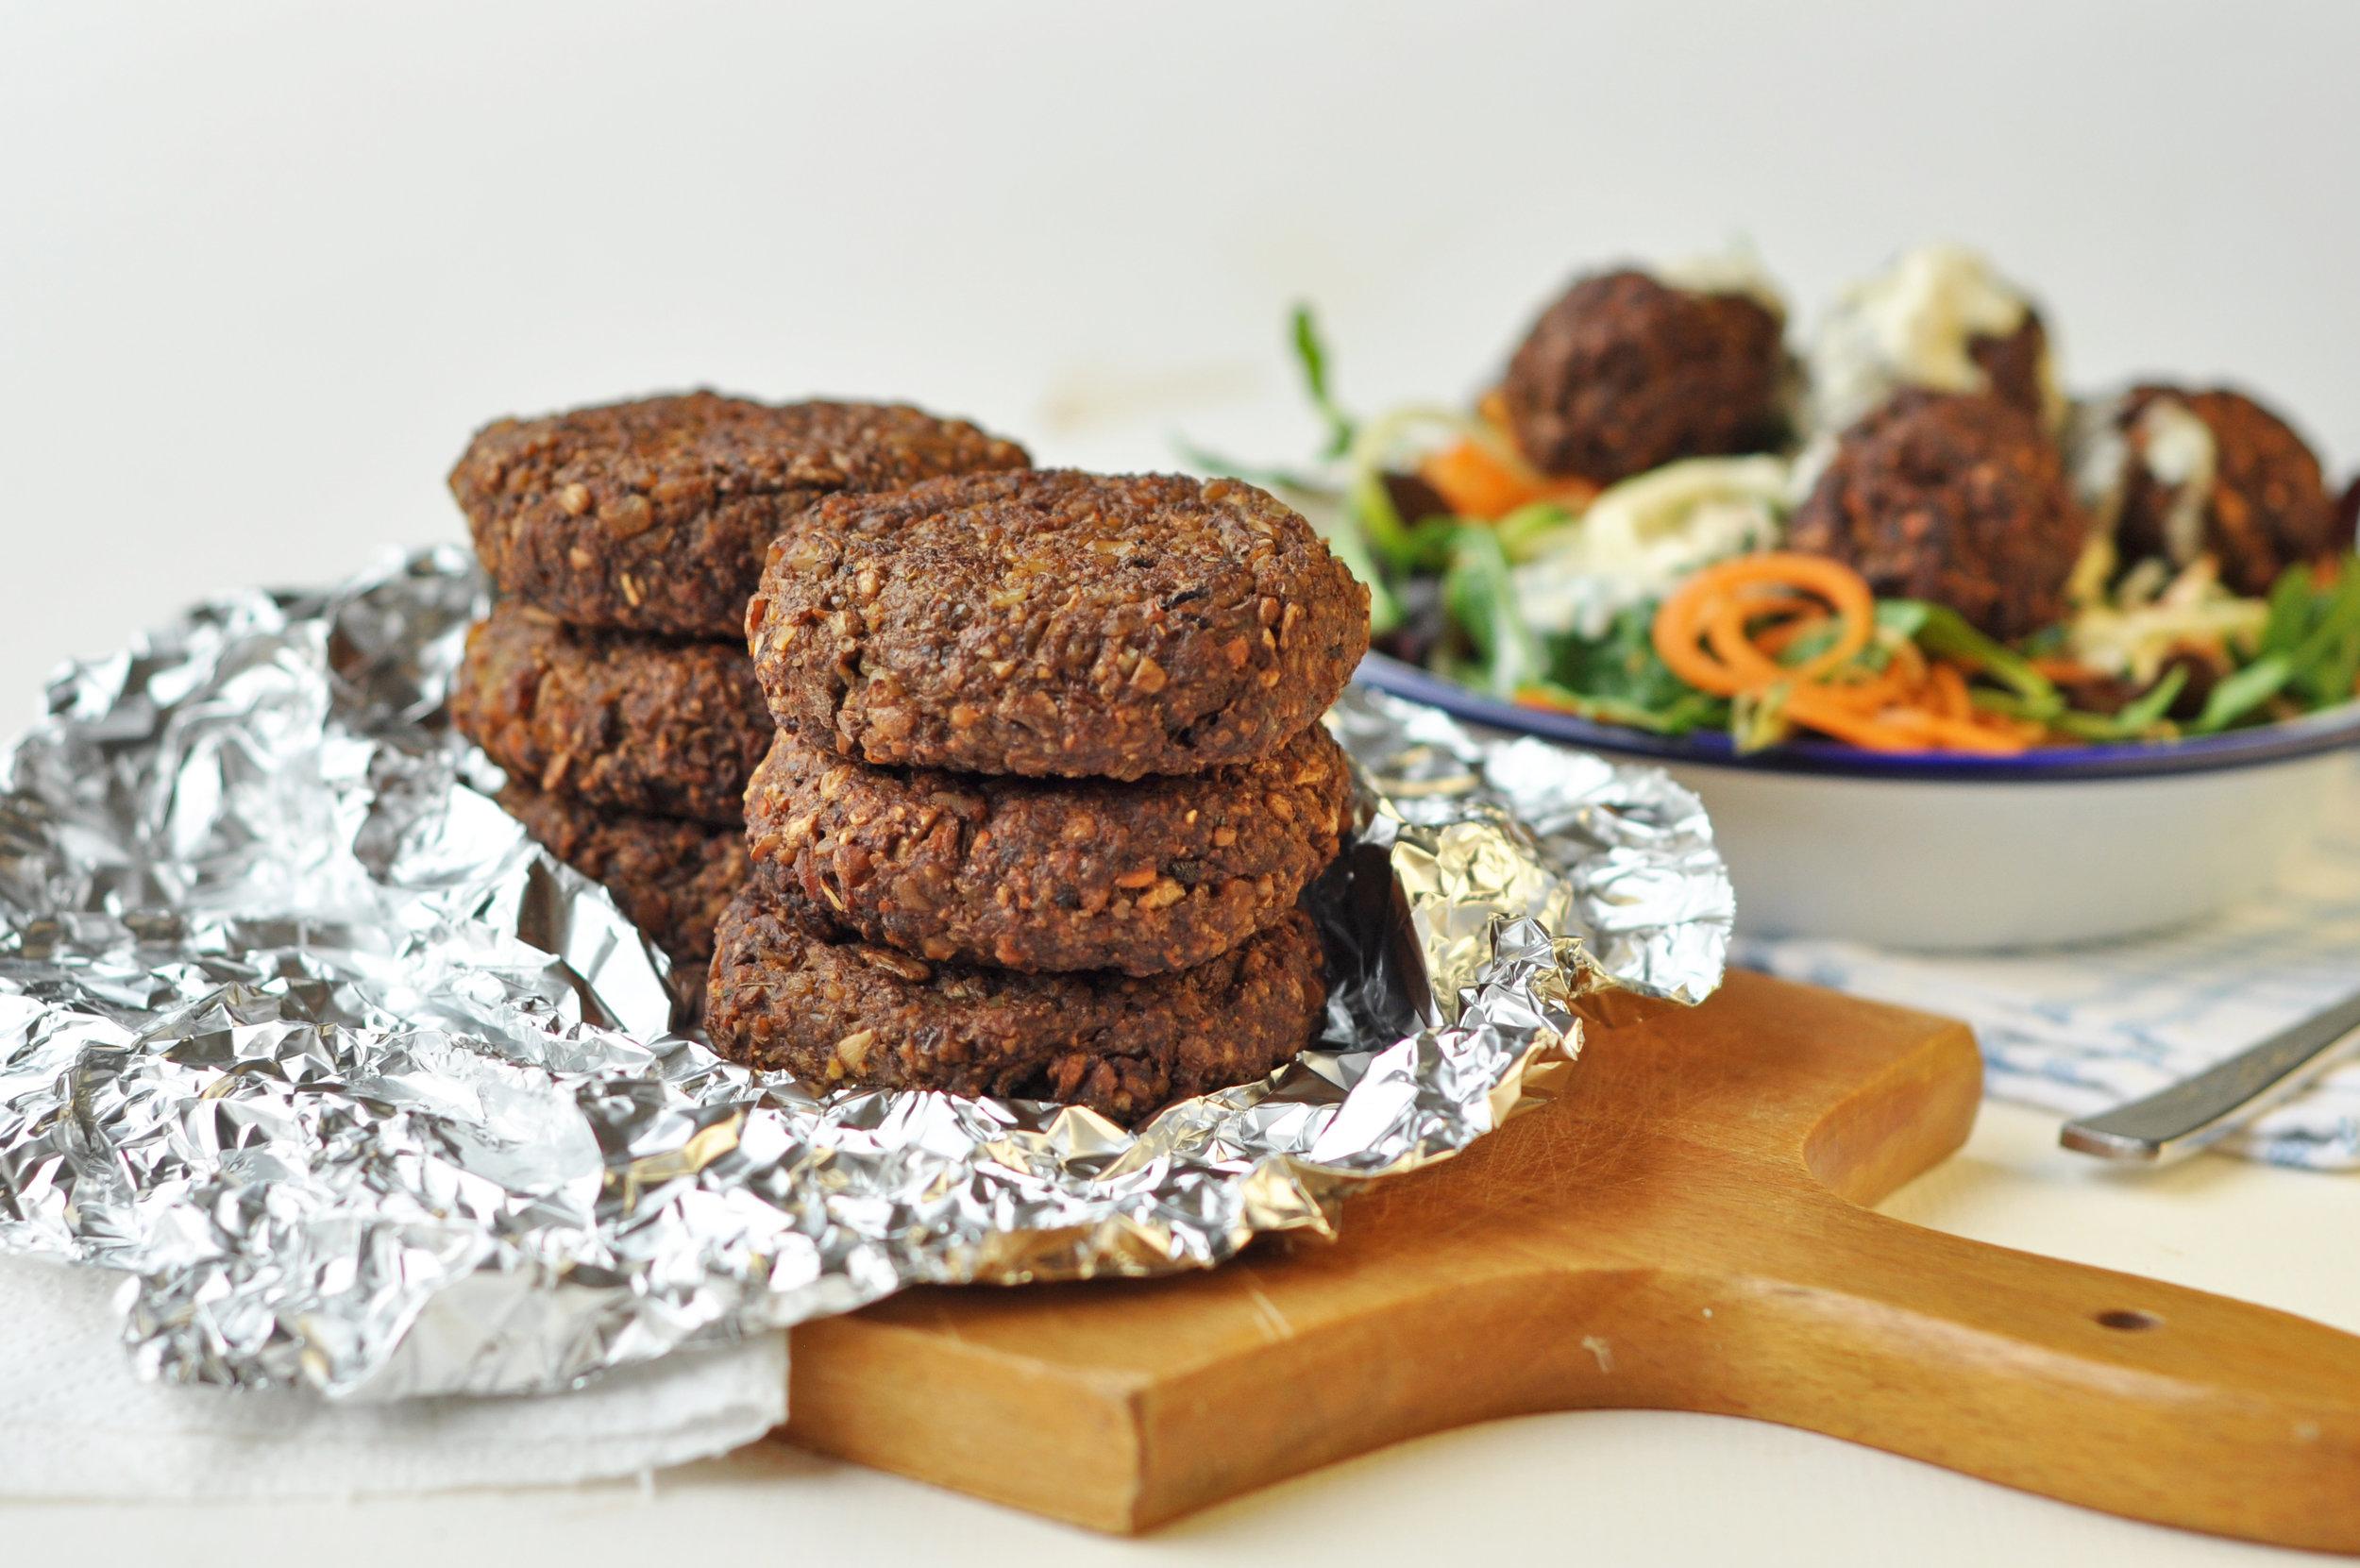 Recipe: vegan burgers